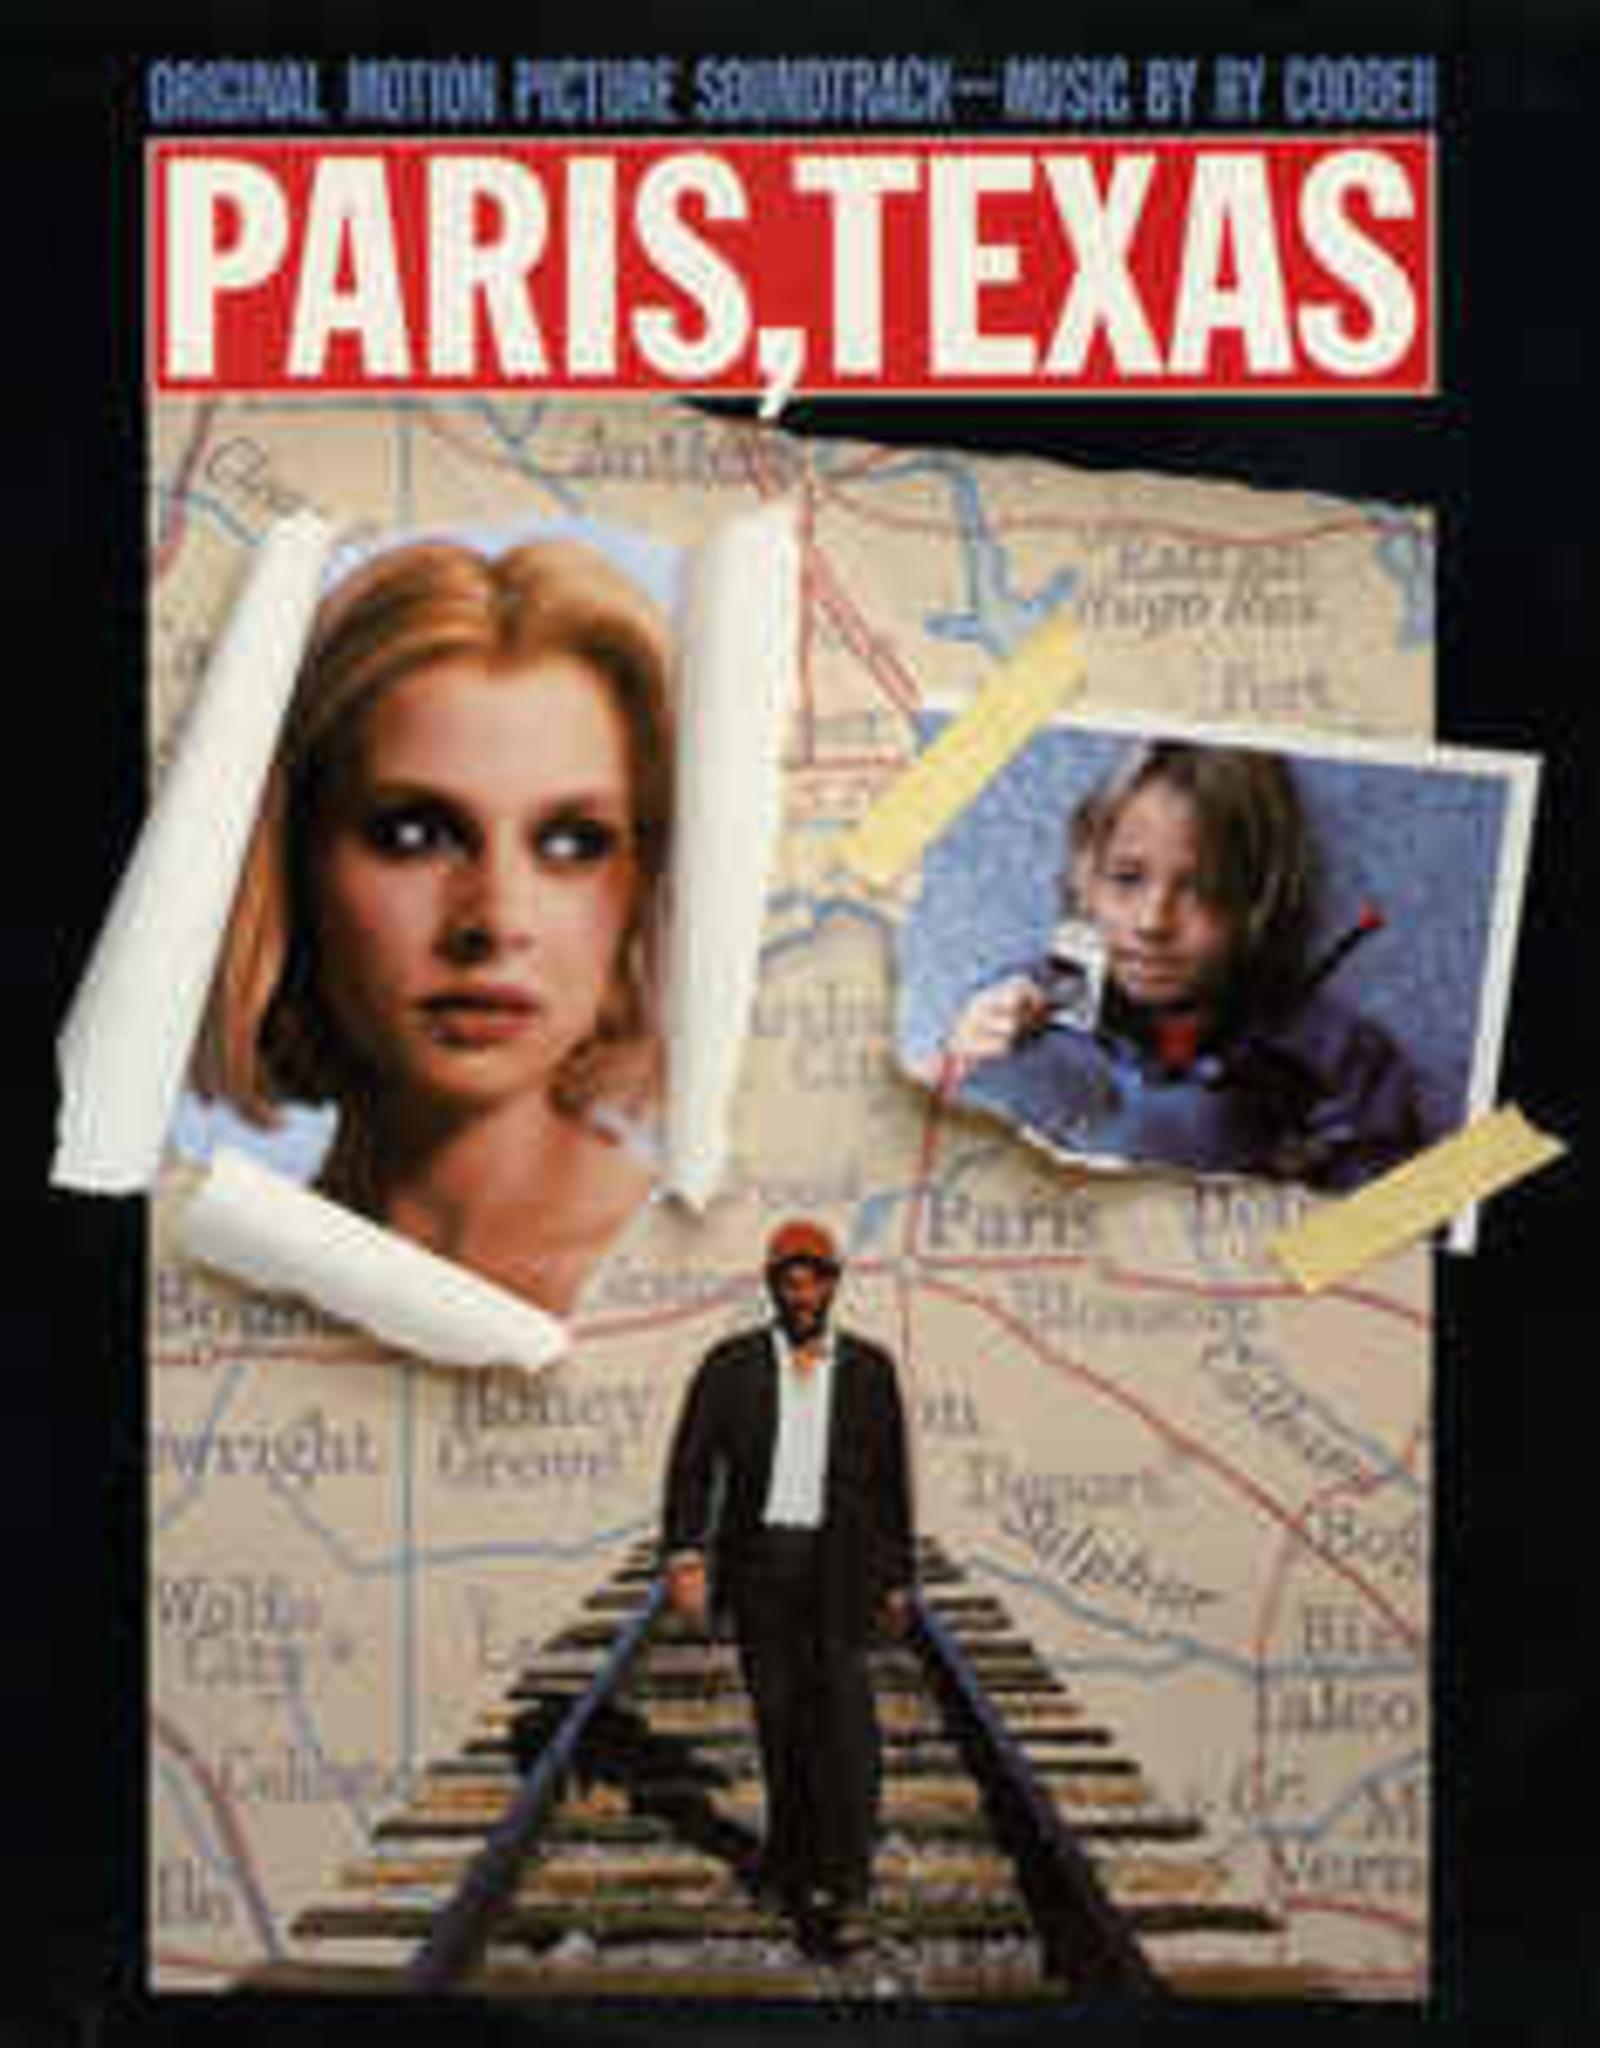 Ry Cooder - Paris, Texas�Original Motion Picture Soundtrack (Limited Clear Vinyl Edition)